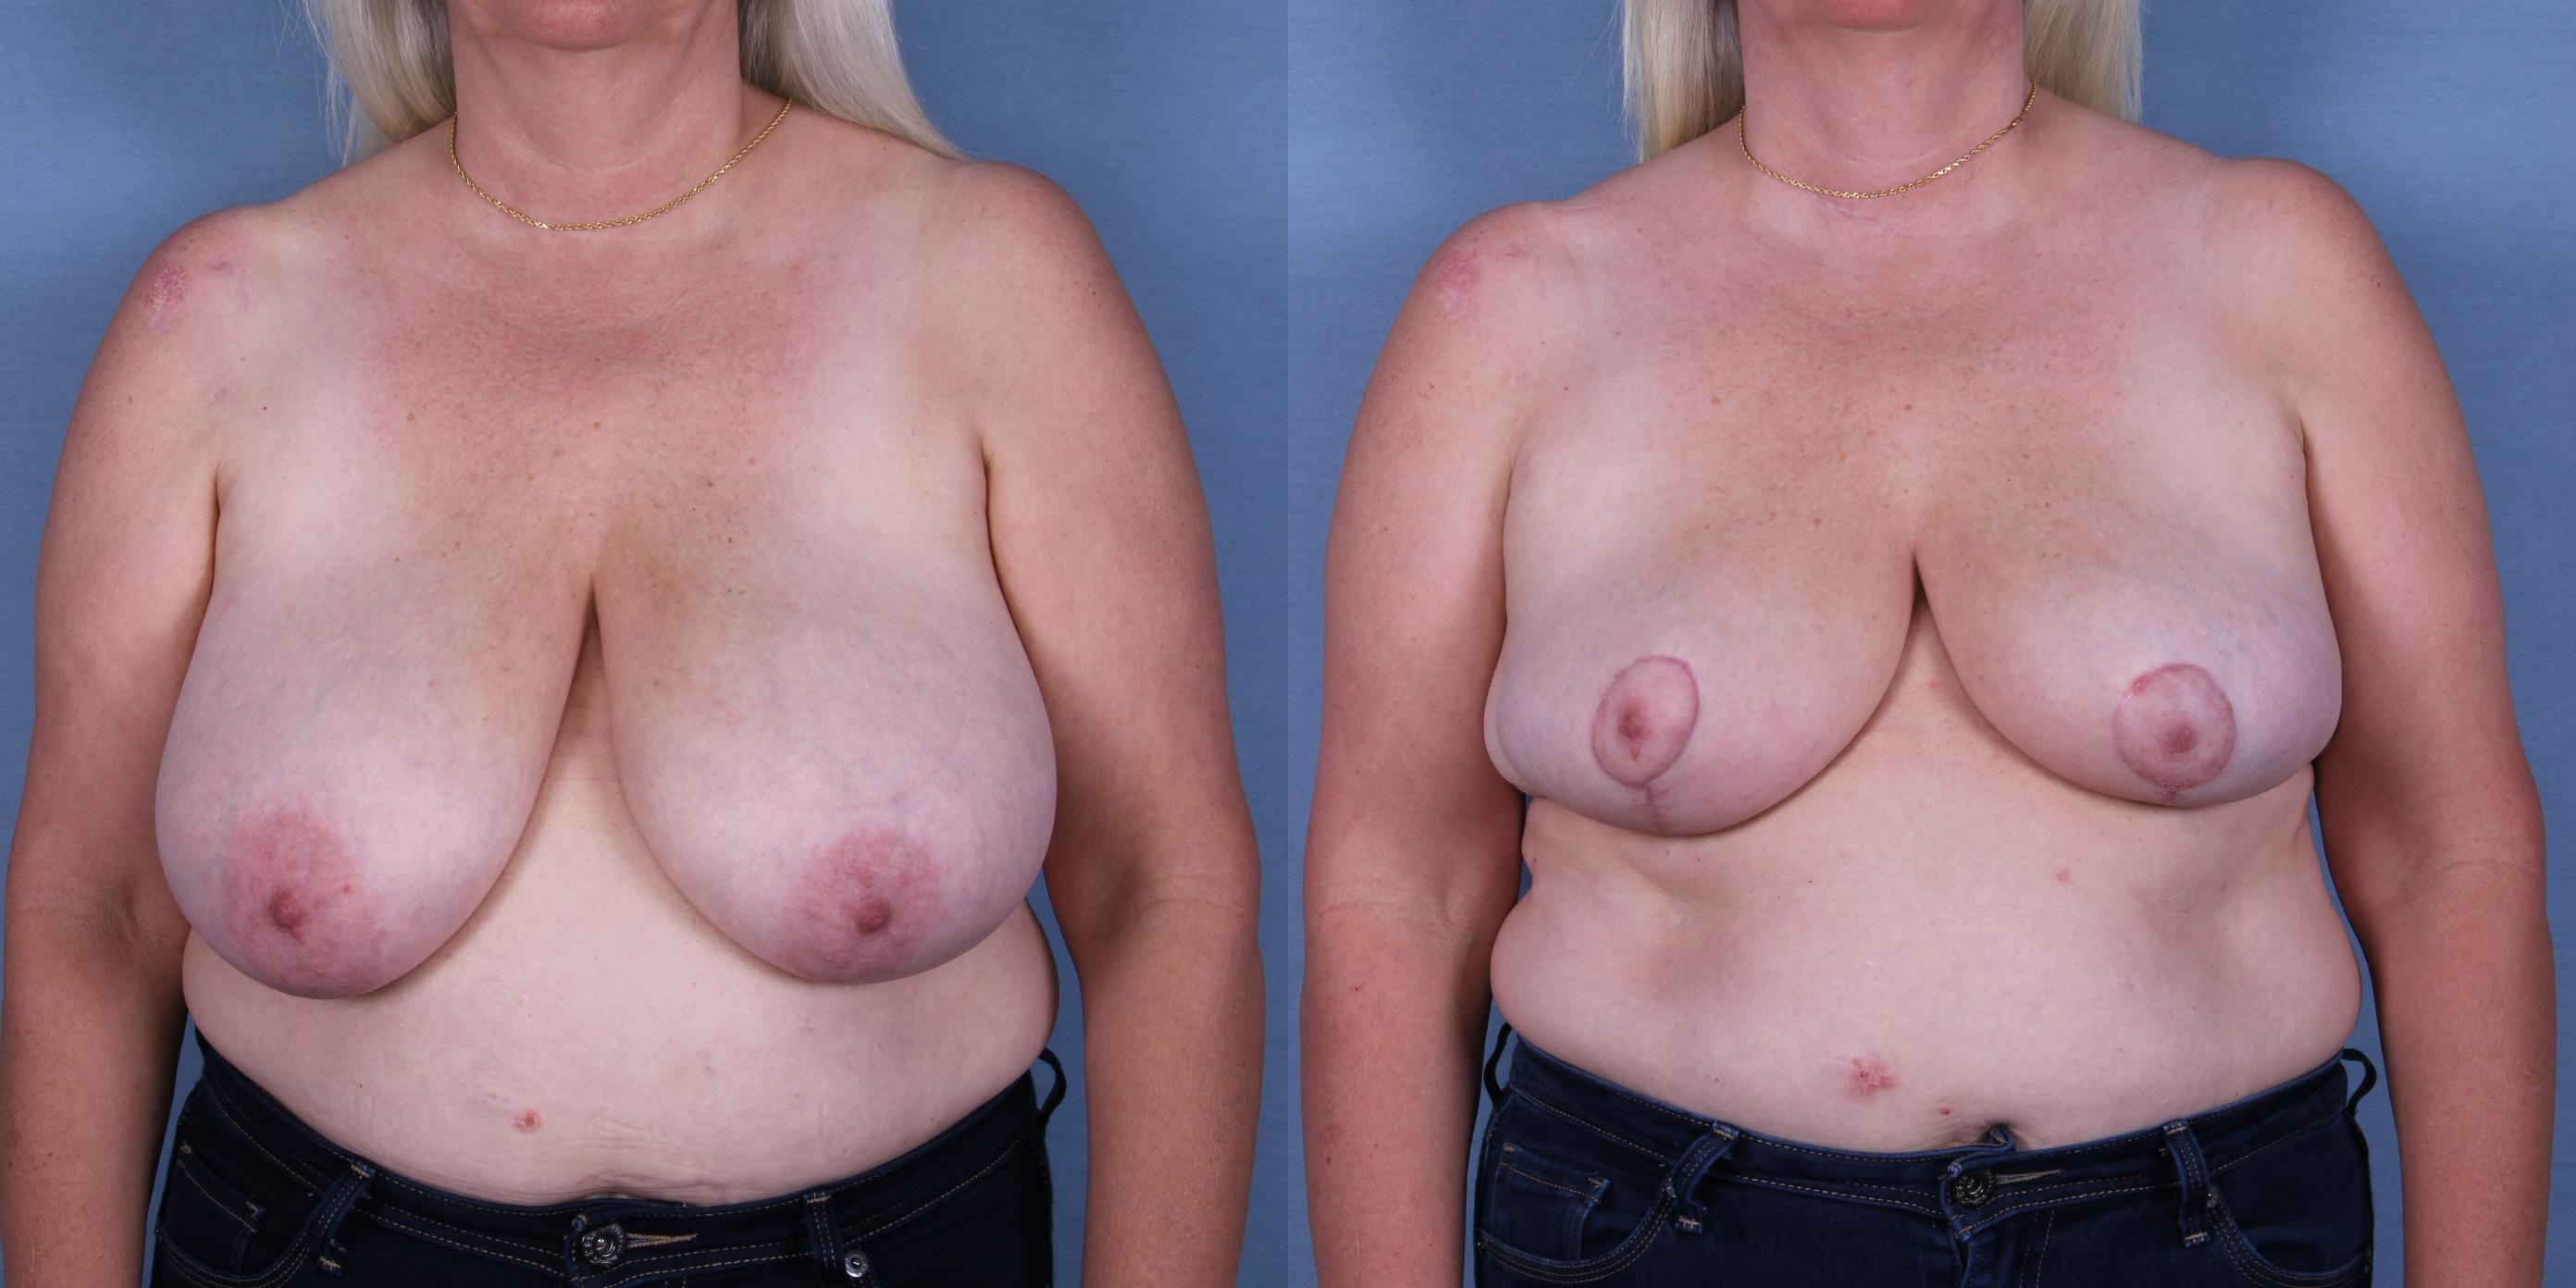 Female Breast Reduction Case #53450 (Image 1)